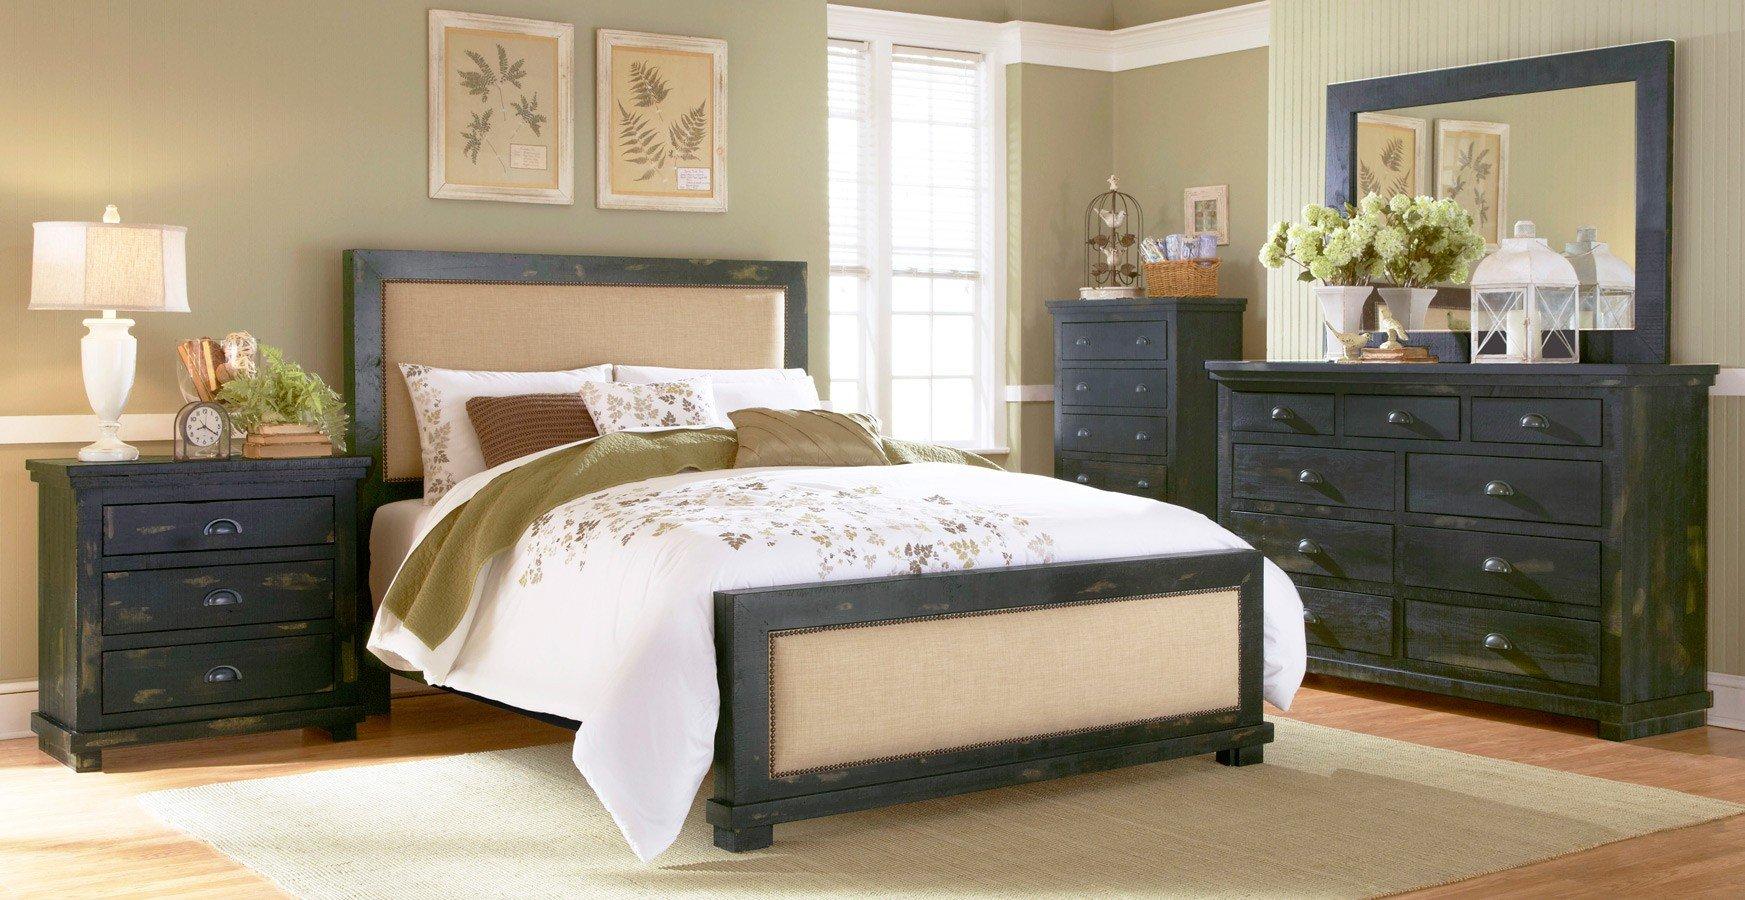 Willow Slat Bedroom Set Distressed Black